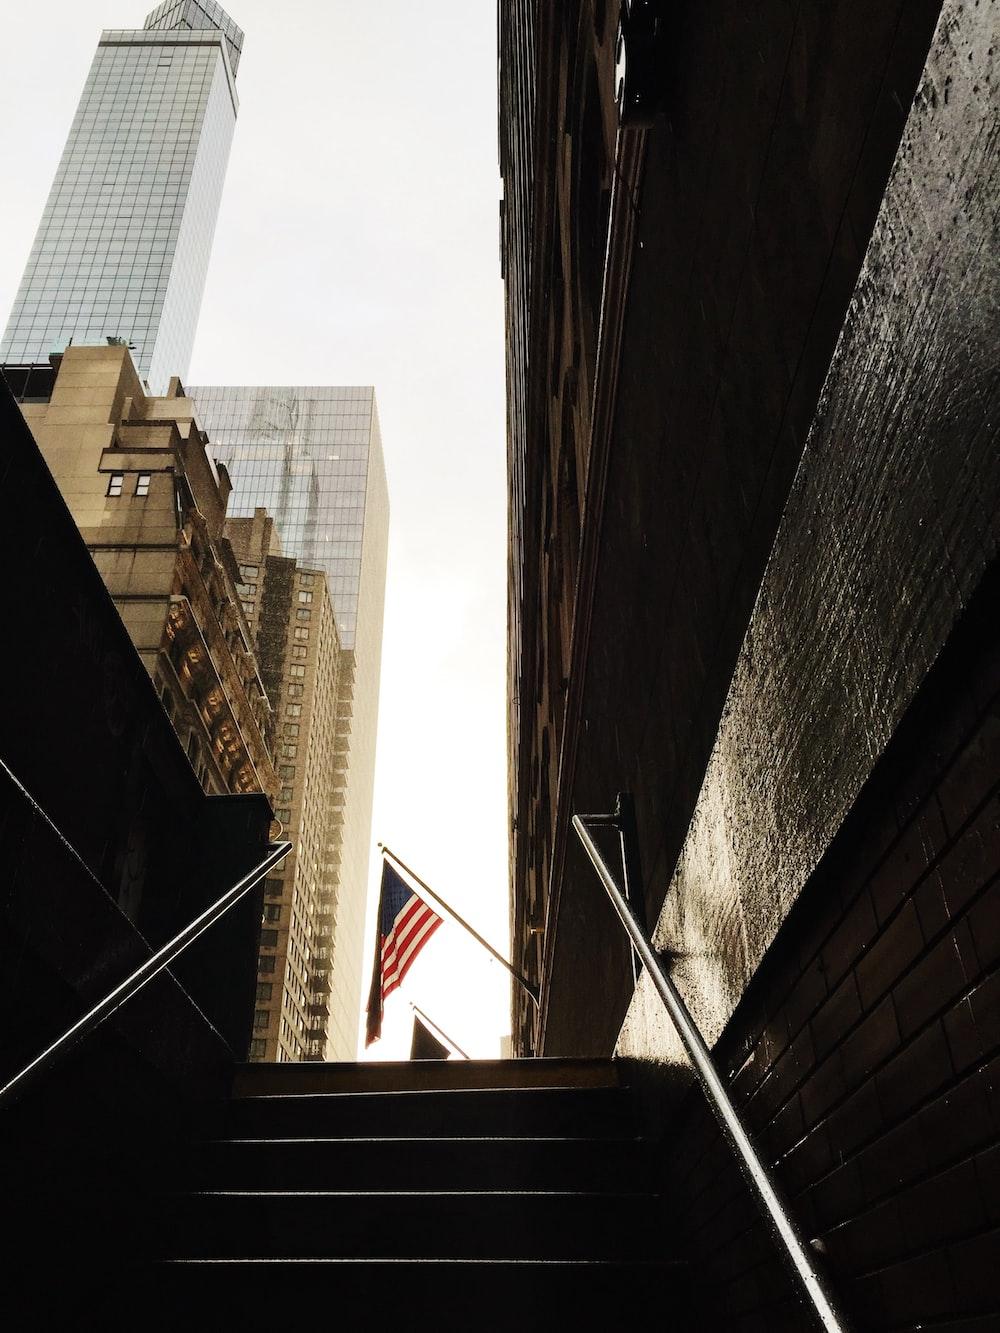 brown high-rise buildings